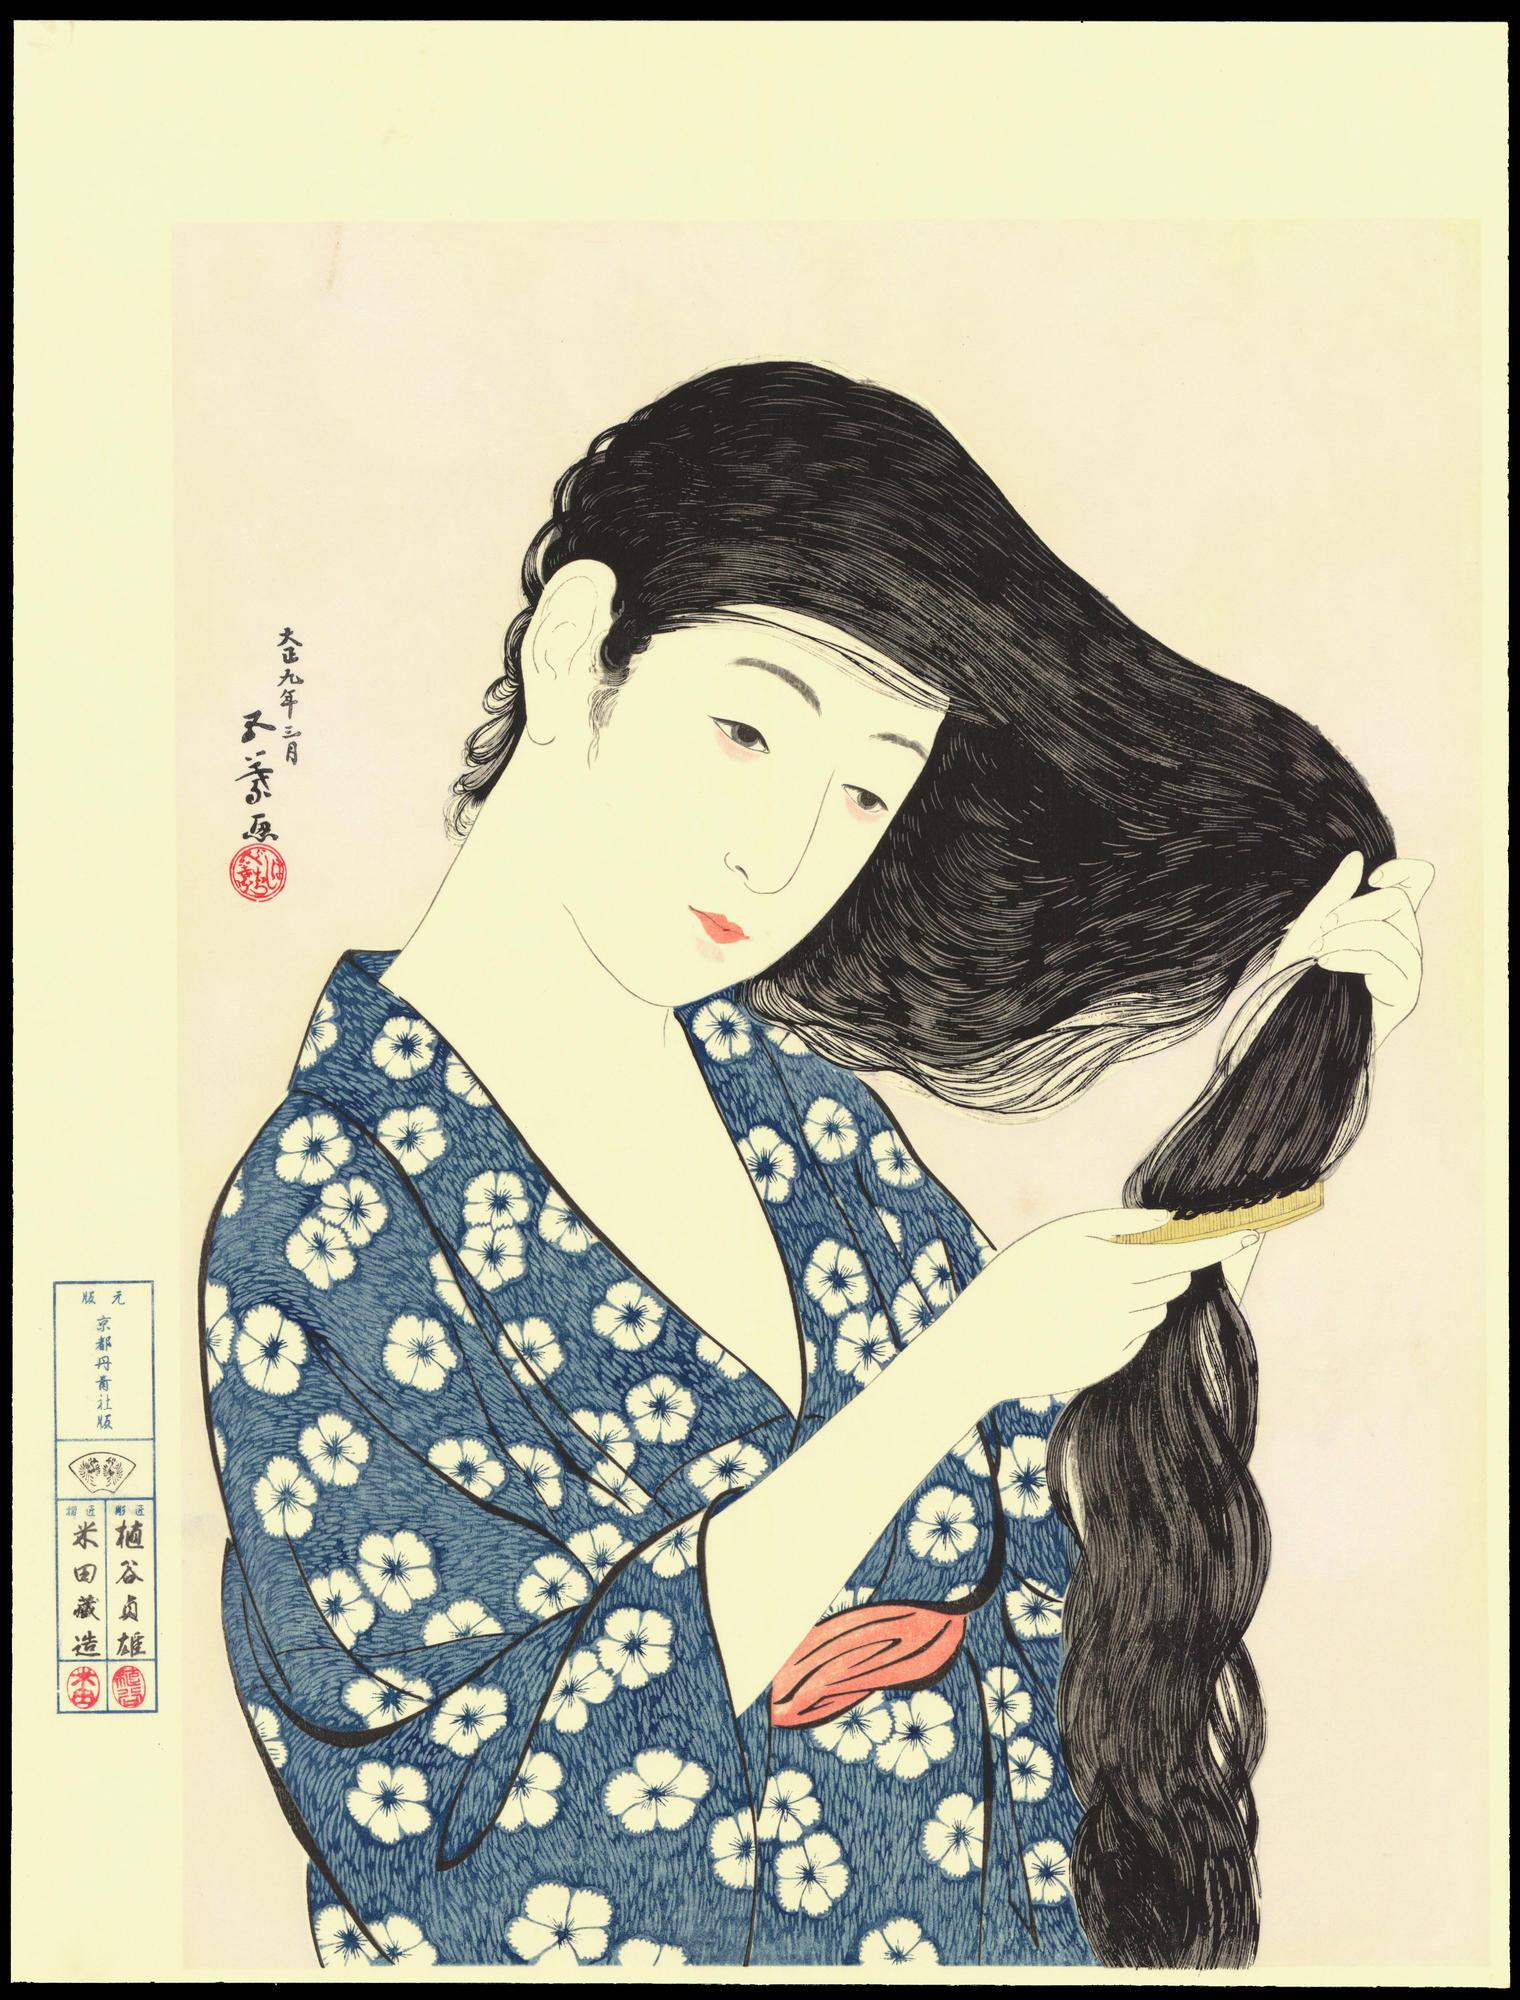 橋口五葉: Woman Combing Her Hair - 髪梳ける女 - Ohmi Gallery - 浮世絵検索